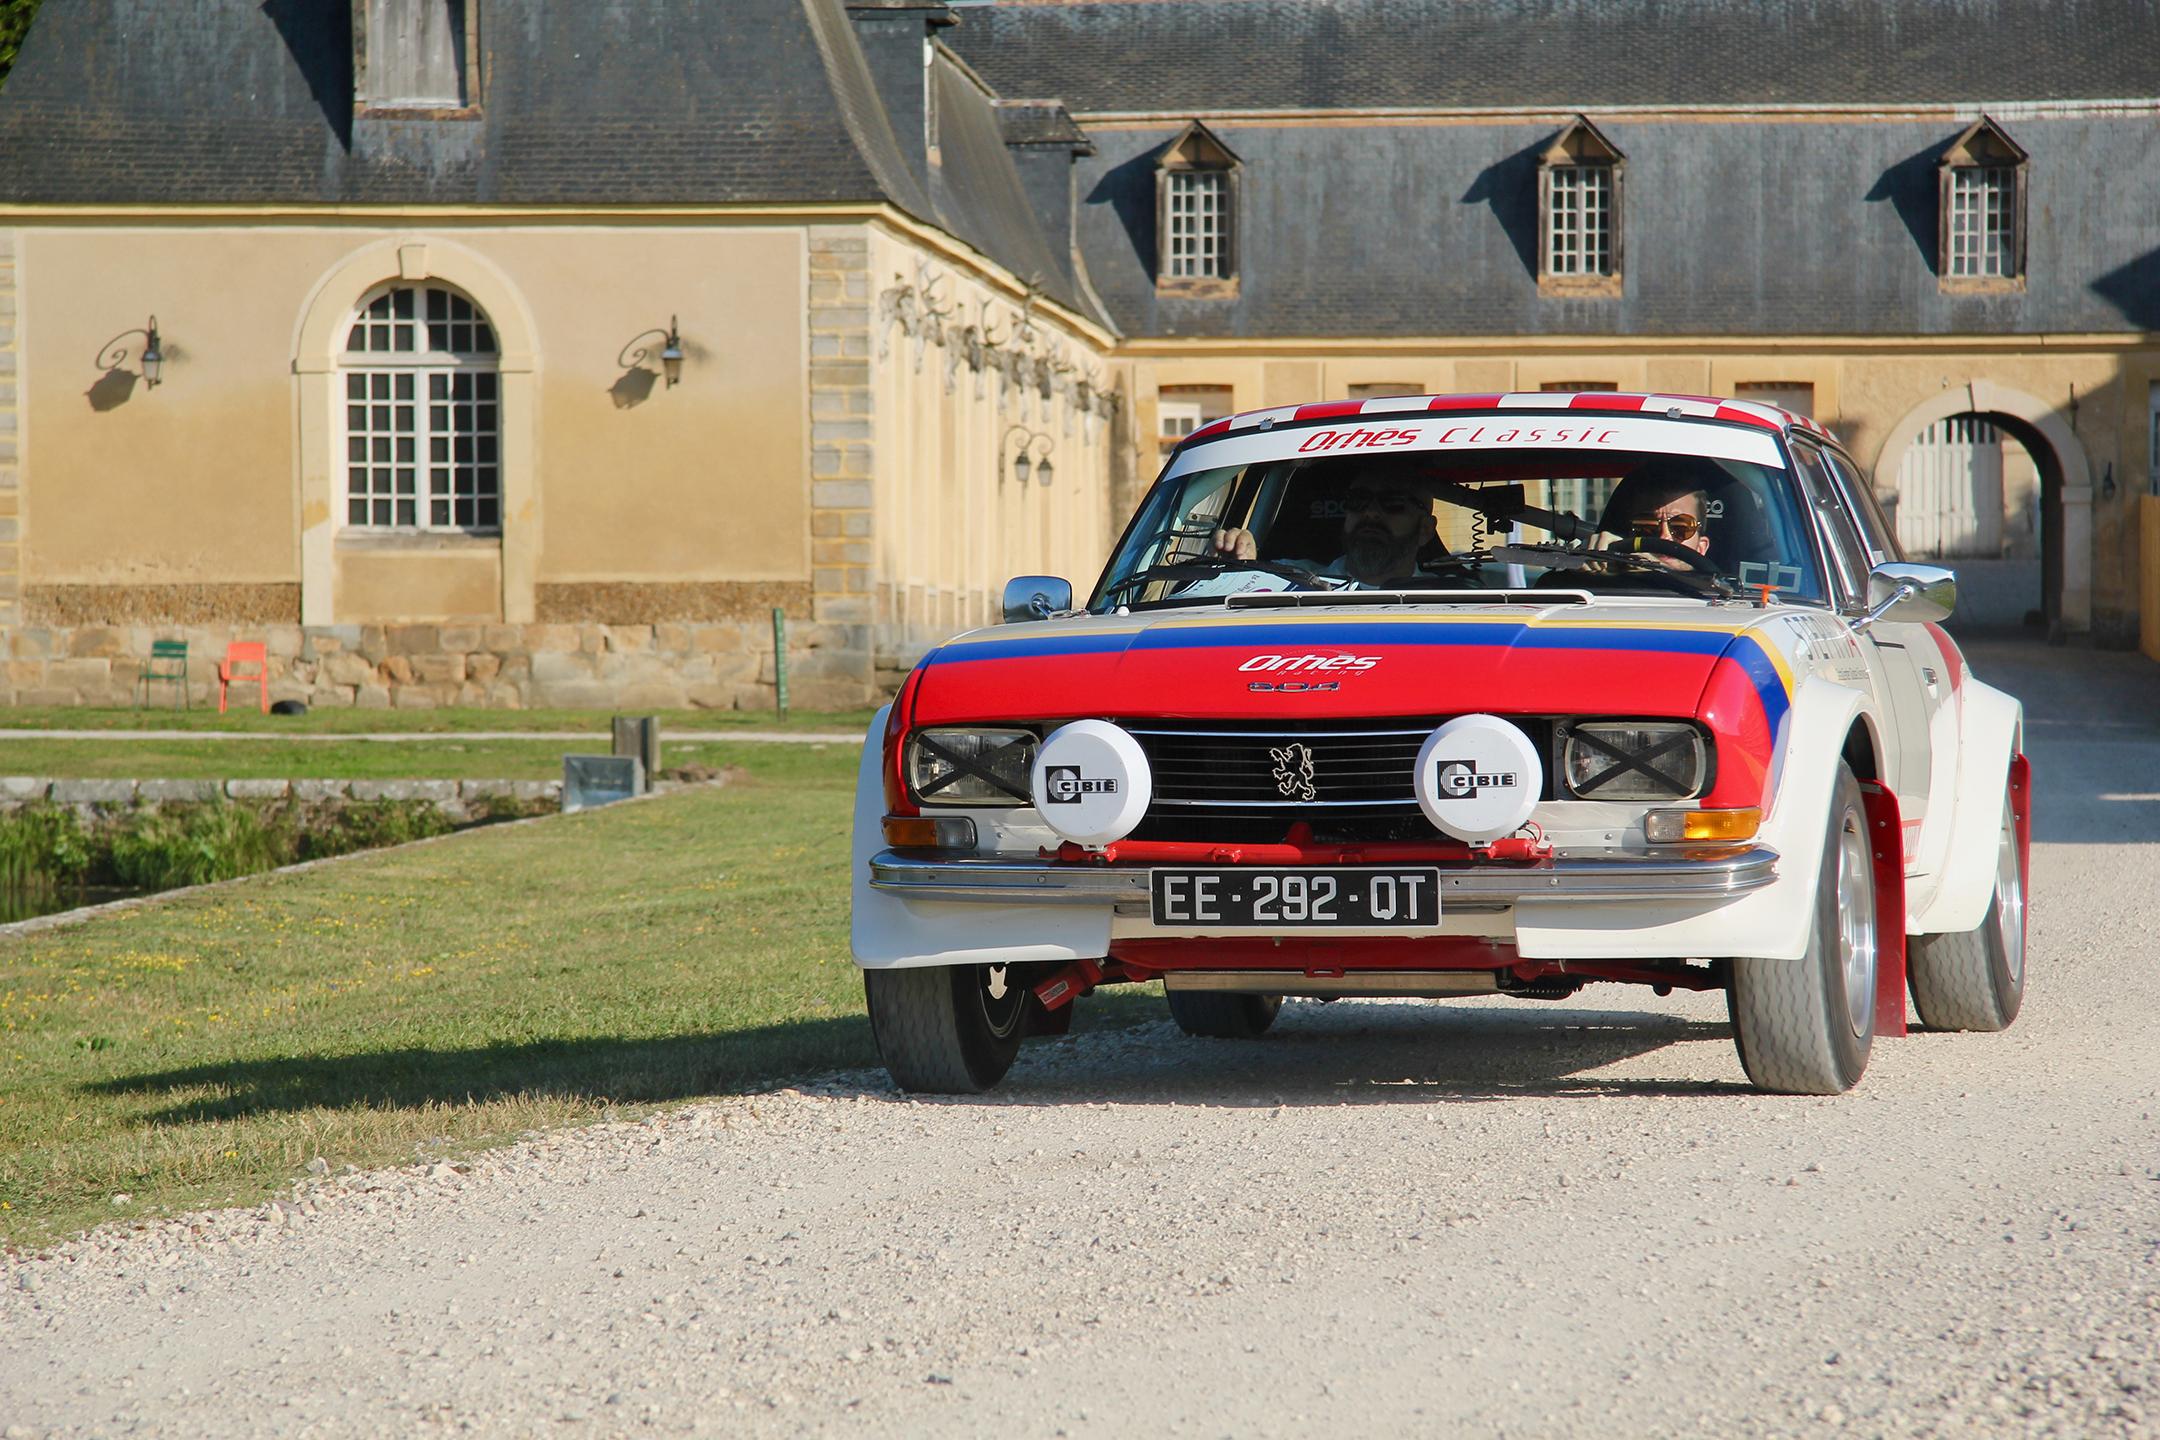 Peugeot 504 Coupé - Gerry Blyenberg - Olivier Pernault - Rallye du Coeur 202 - photo Ludo Ferrari